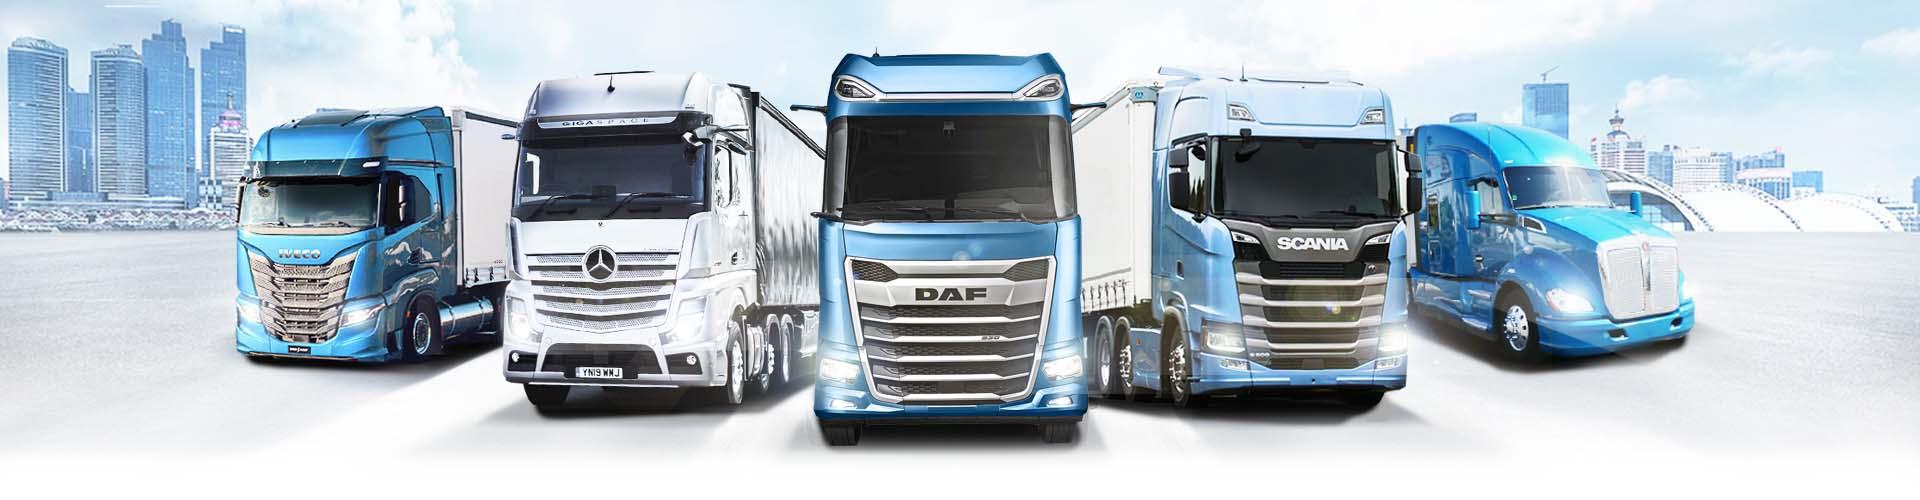 Berco Truck Components Trucks City skyline Customers DAF New generation IVECO Mercedes Scania Kenworth Peterbilt